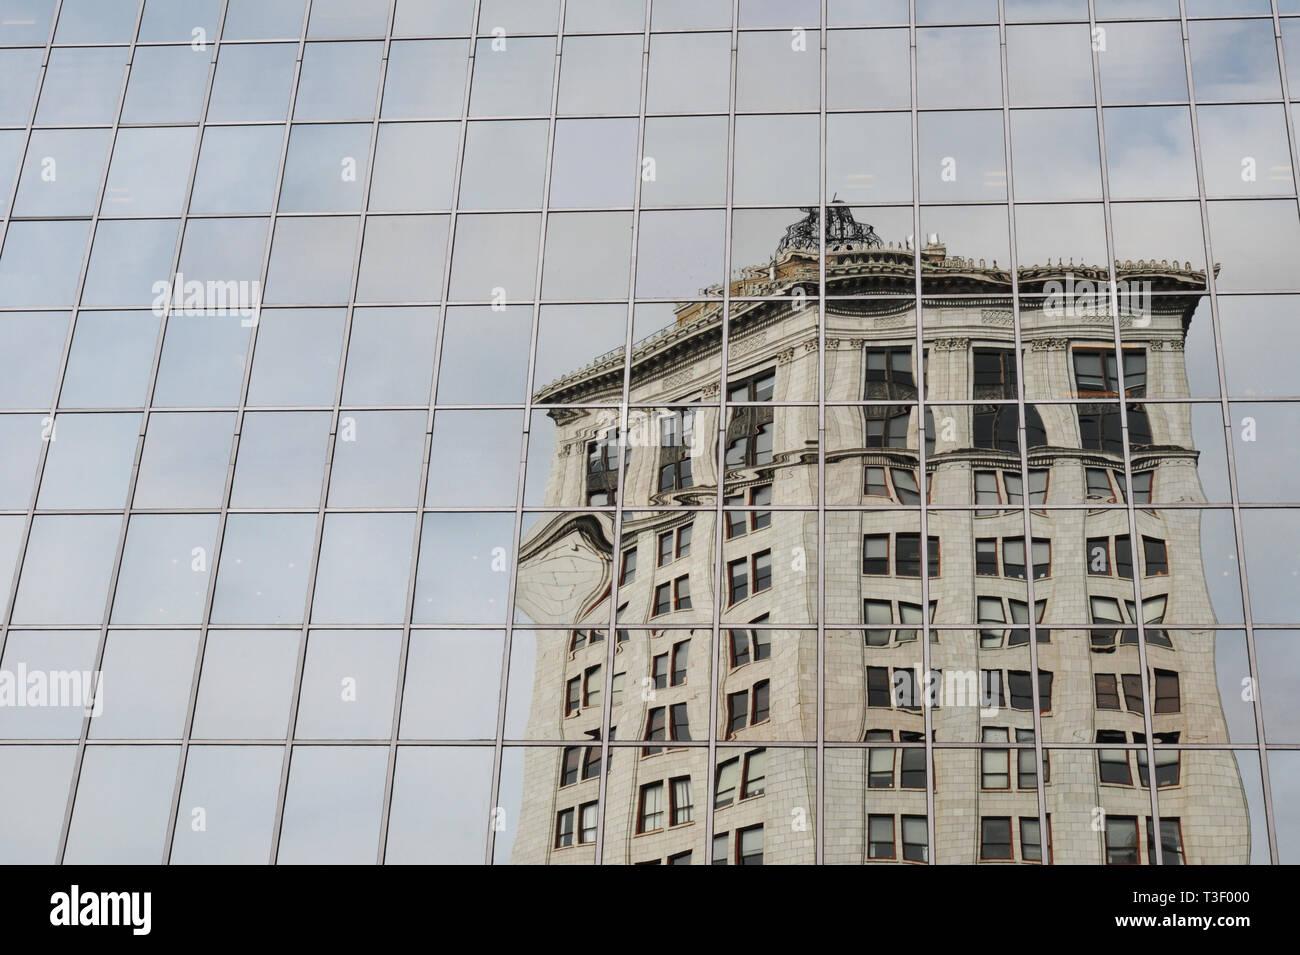 Pnc Bank Building Stock Photos & Pnc Bank Building Stock Images - Alamy